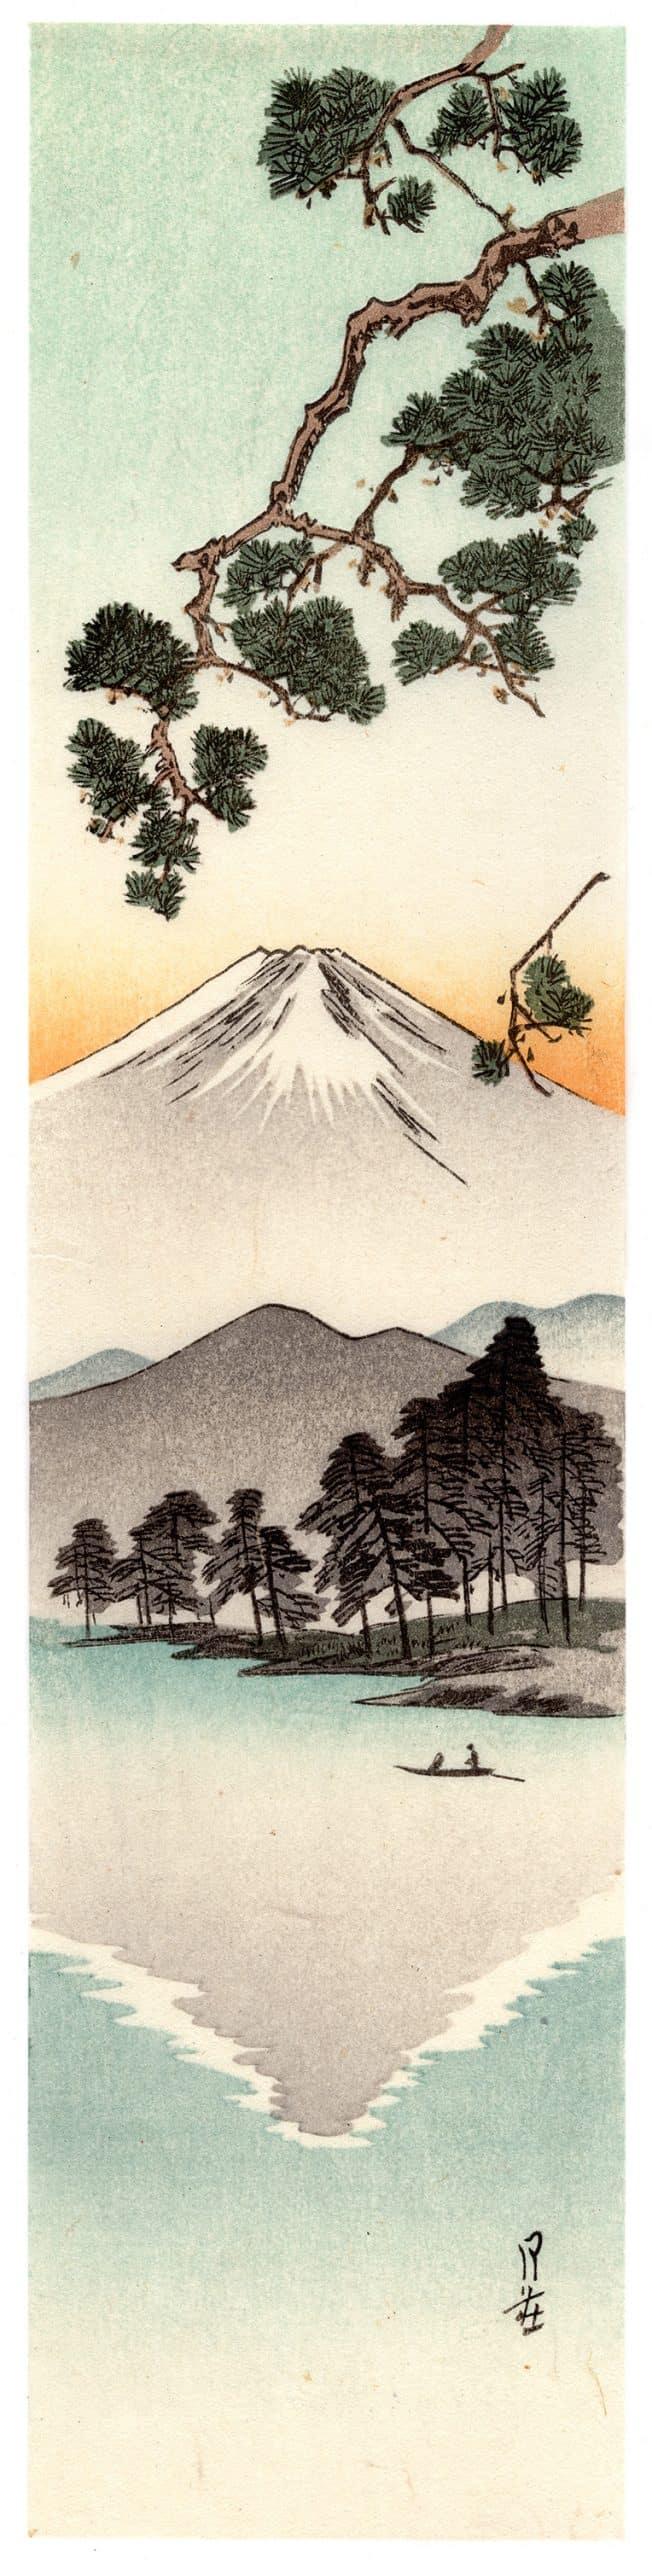 Yoshimoto Gesso - Mt. Fuji and its Reflection